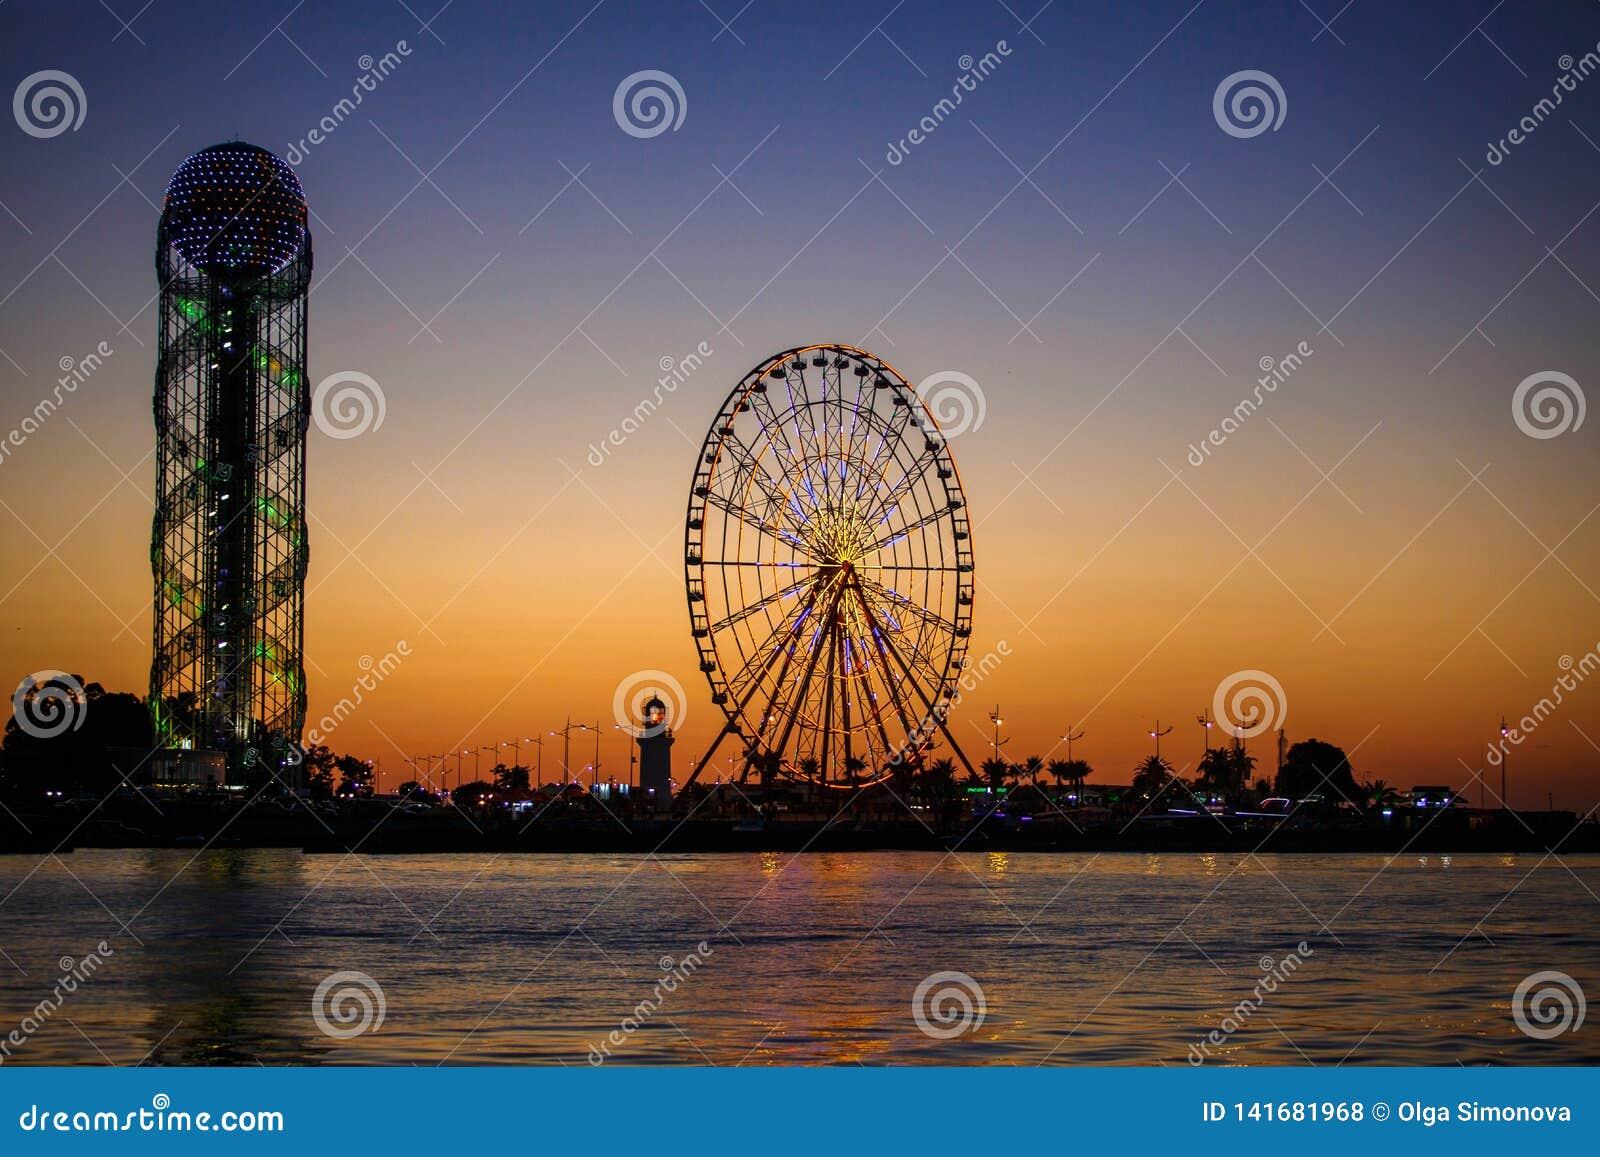 Ferris Wheel And Georgian Alphabet Tower On Orange Sunset Background Editorial Stock Photo Image Of High Circle 141681968